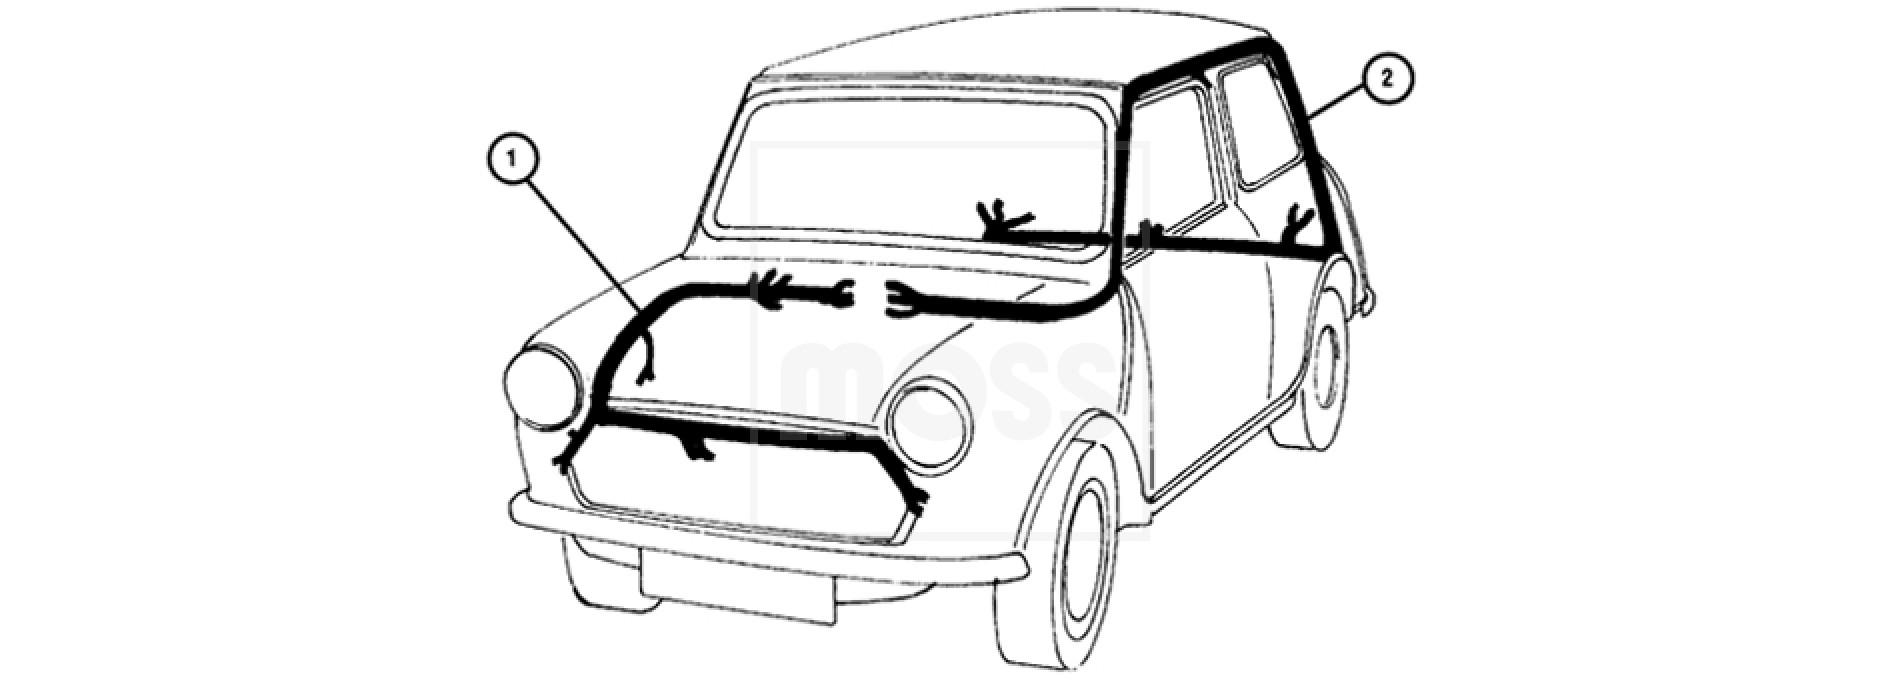 Le 7303 Classic Mini Wiring Loom